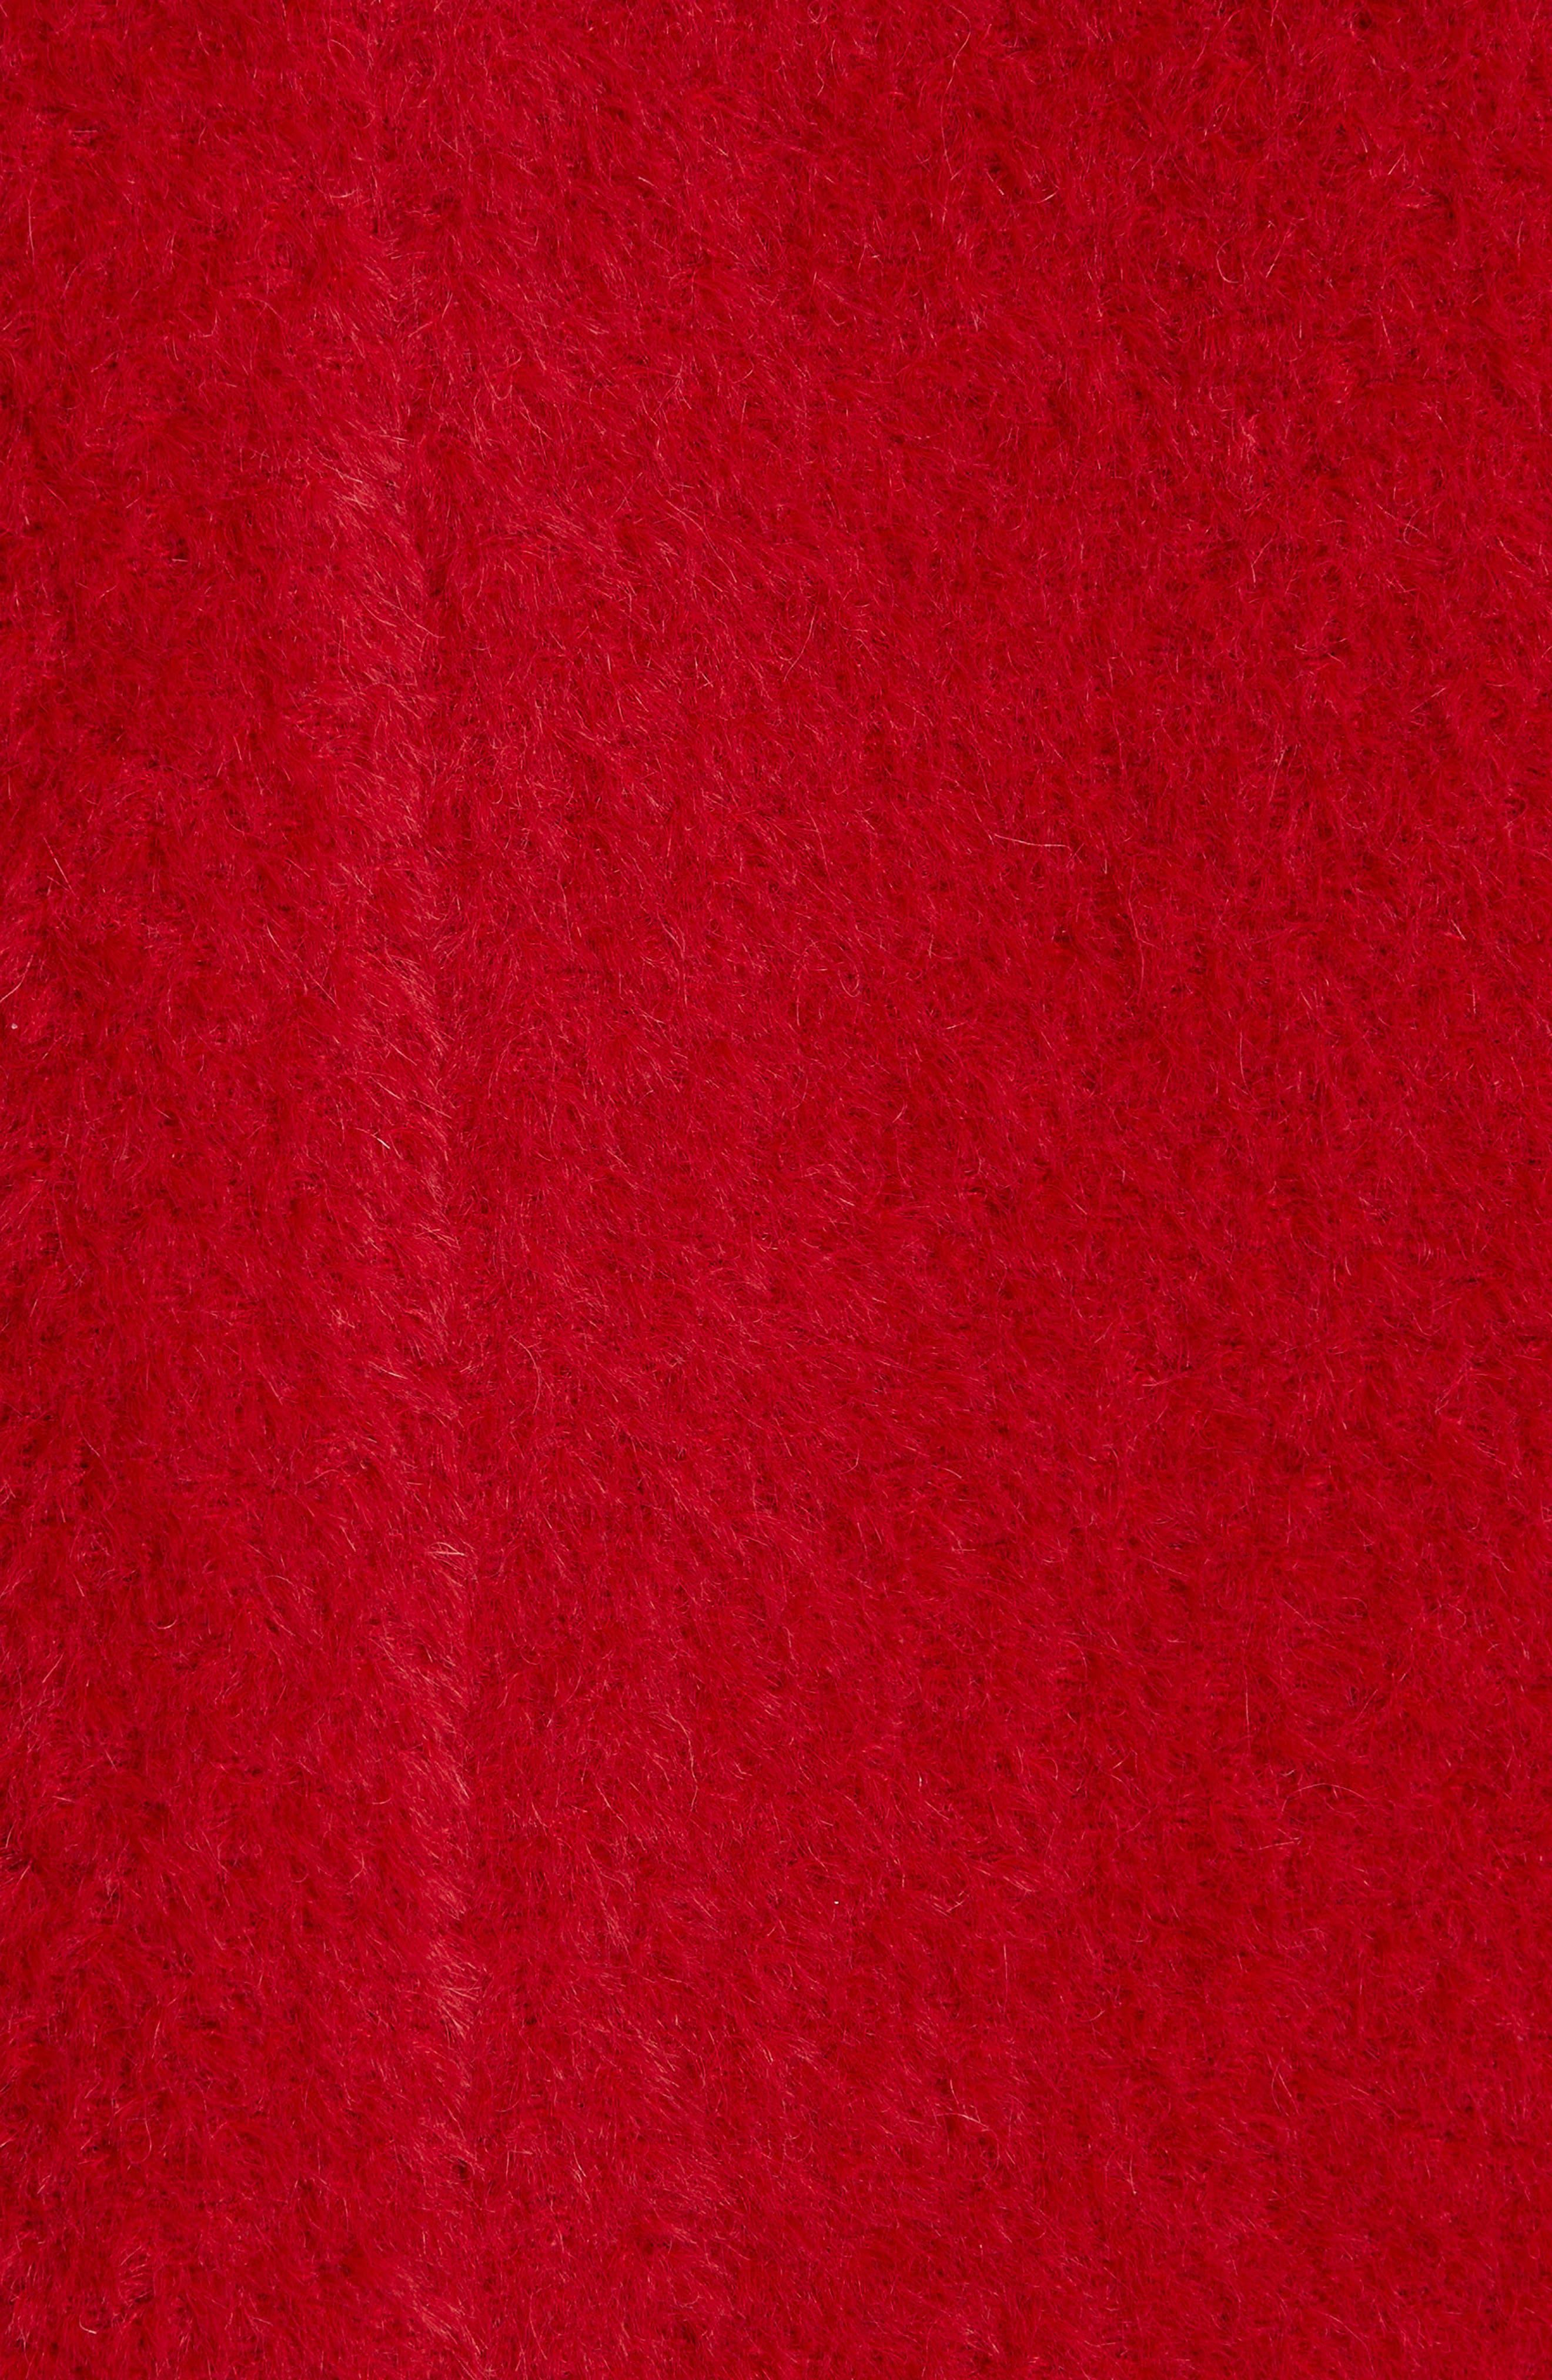 Wool & Alpaca Blend Jacket,                             Alternate thumbnail 7, color,                             LACQUER